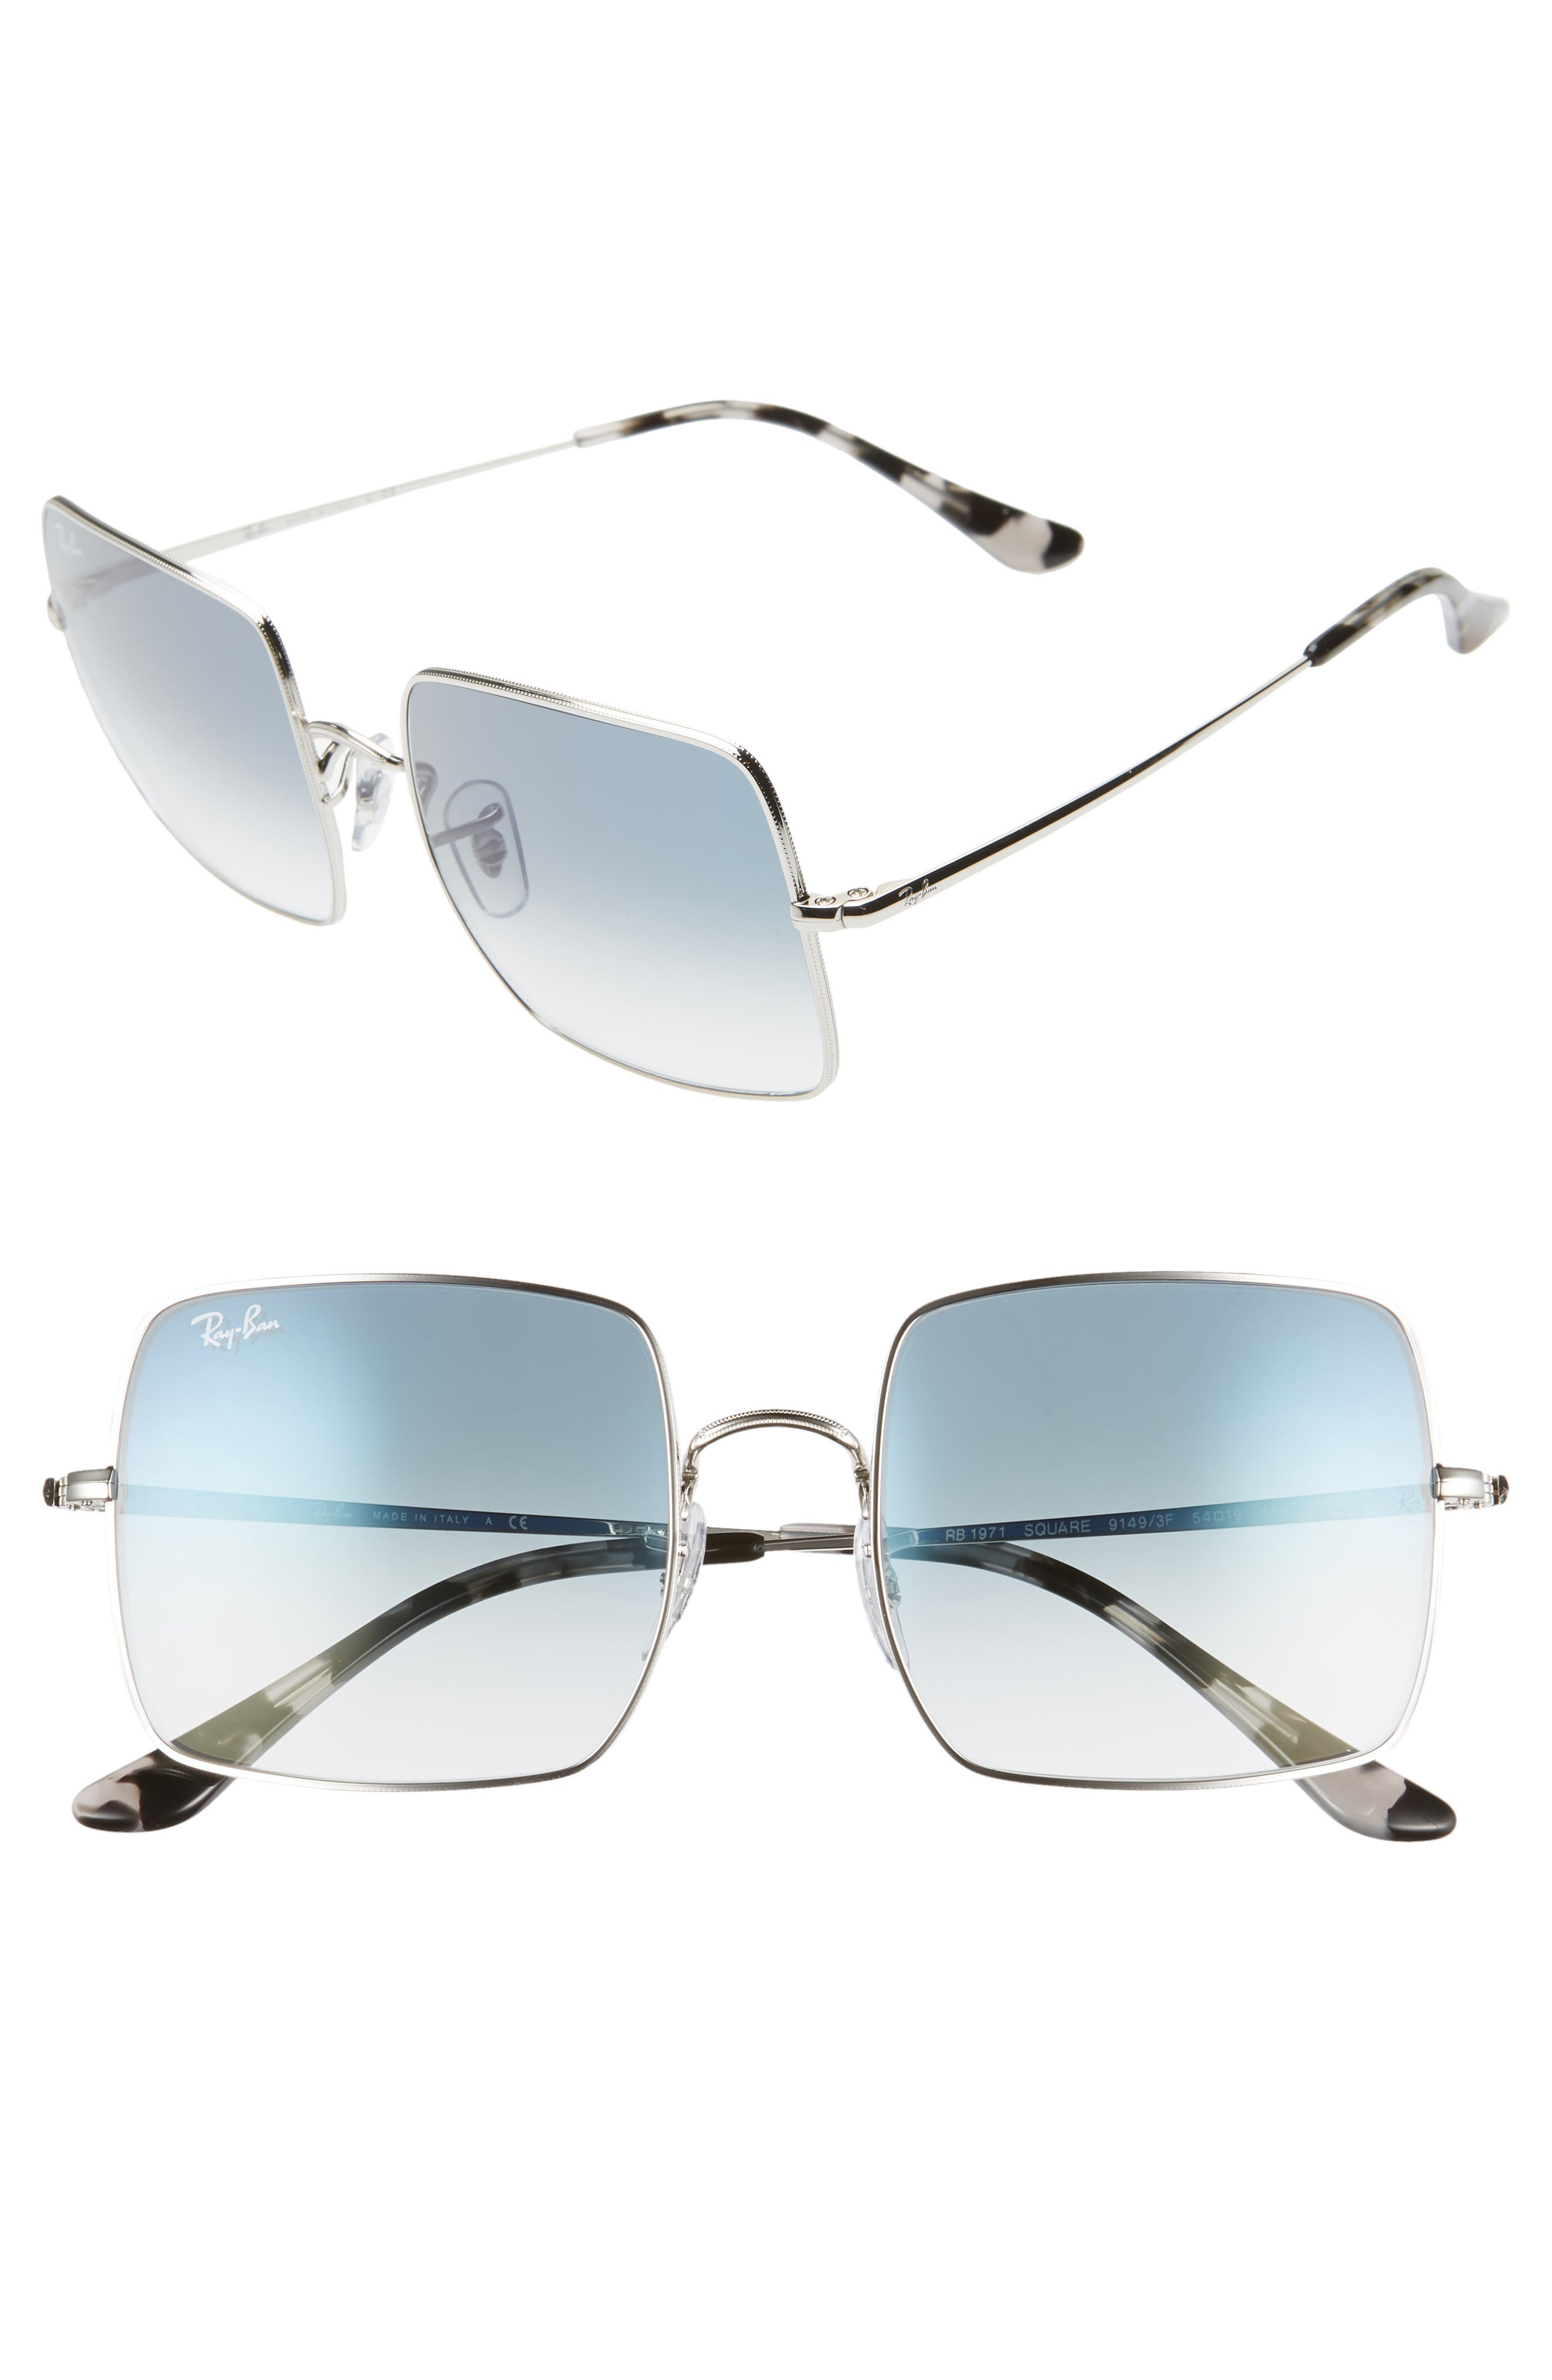 Ray-Ban 5m Square Sunglasses - Silver/ Blue Gradient